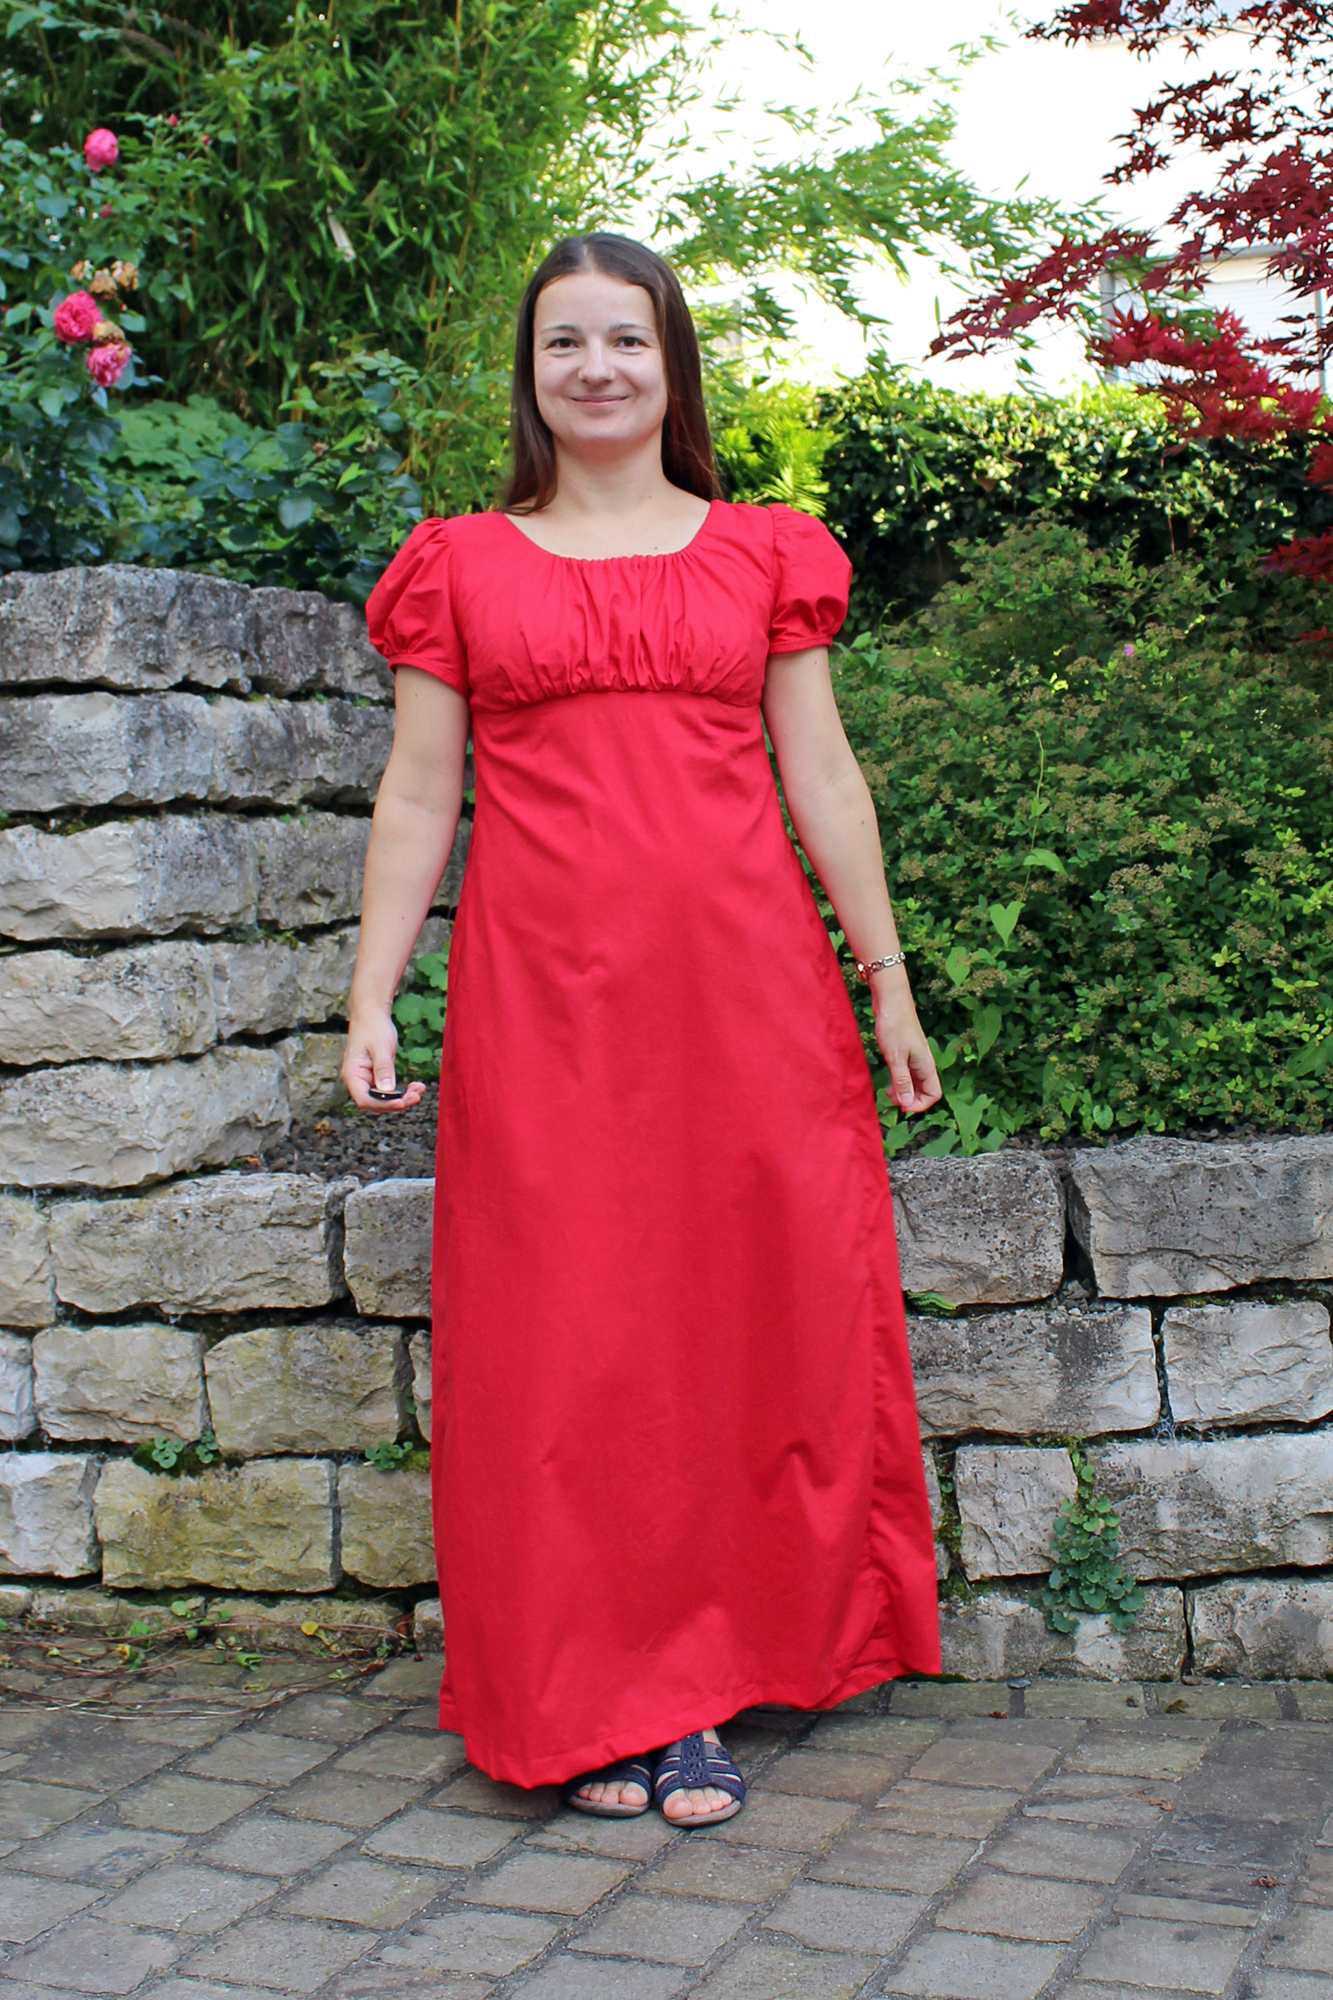 Regency-Kleid nach dem Schnitt Simplicity 4055